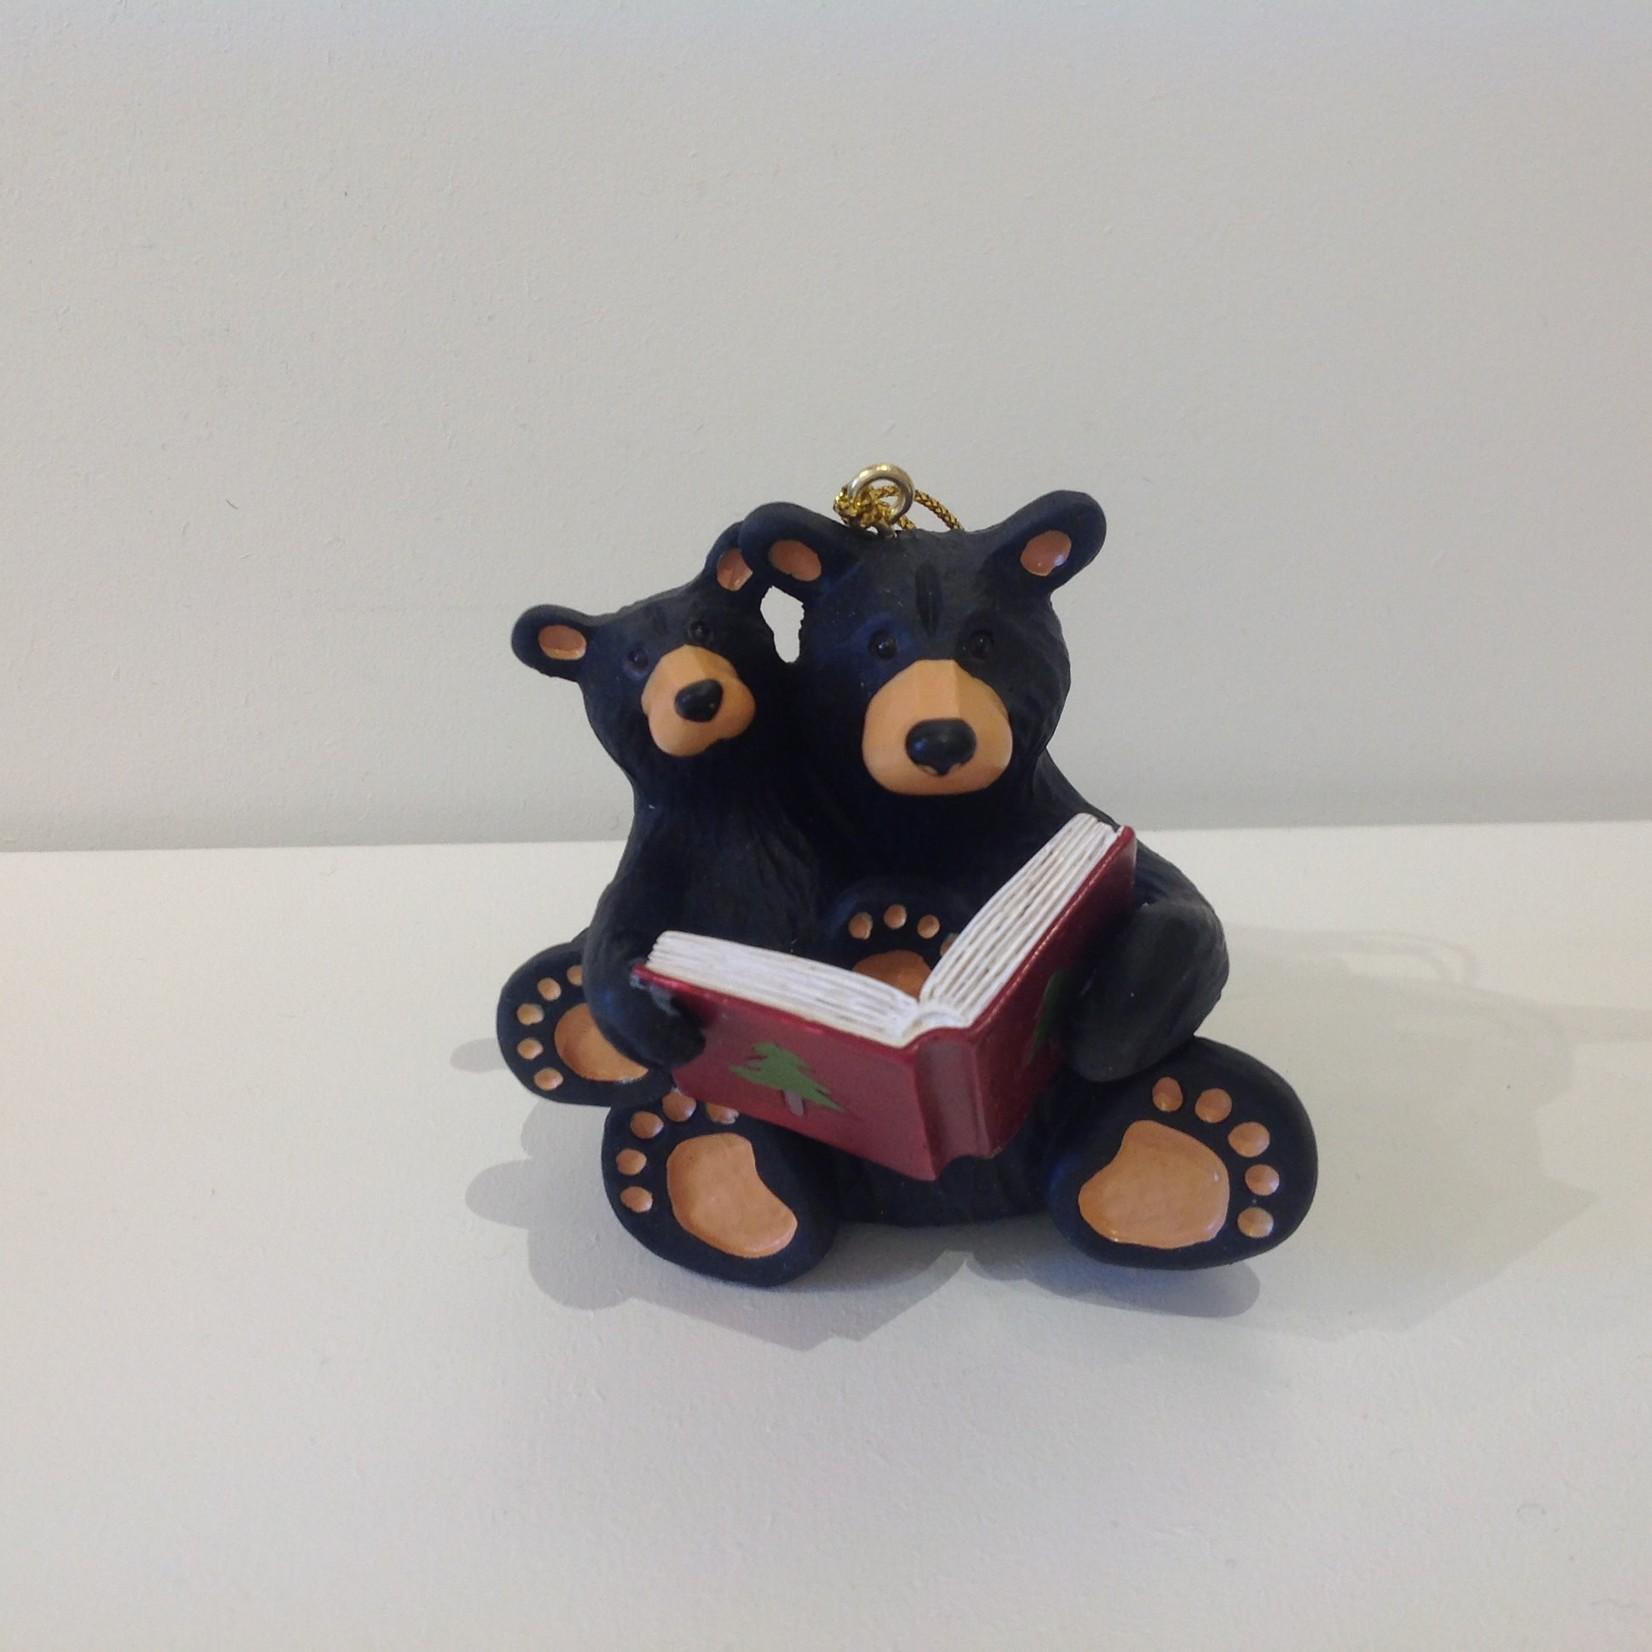 Bear Christmas Story Ornament